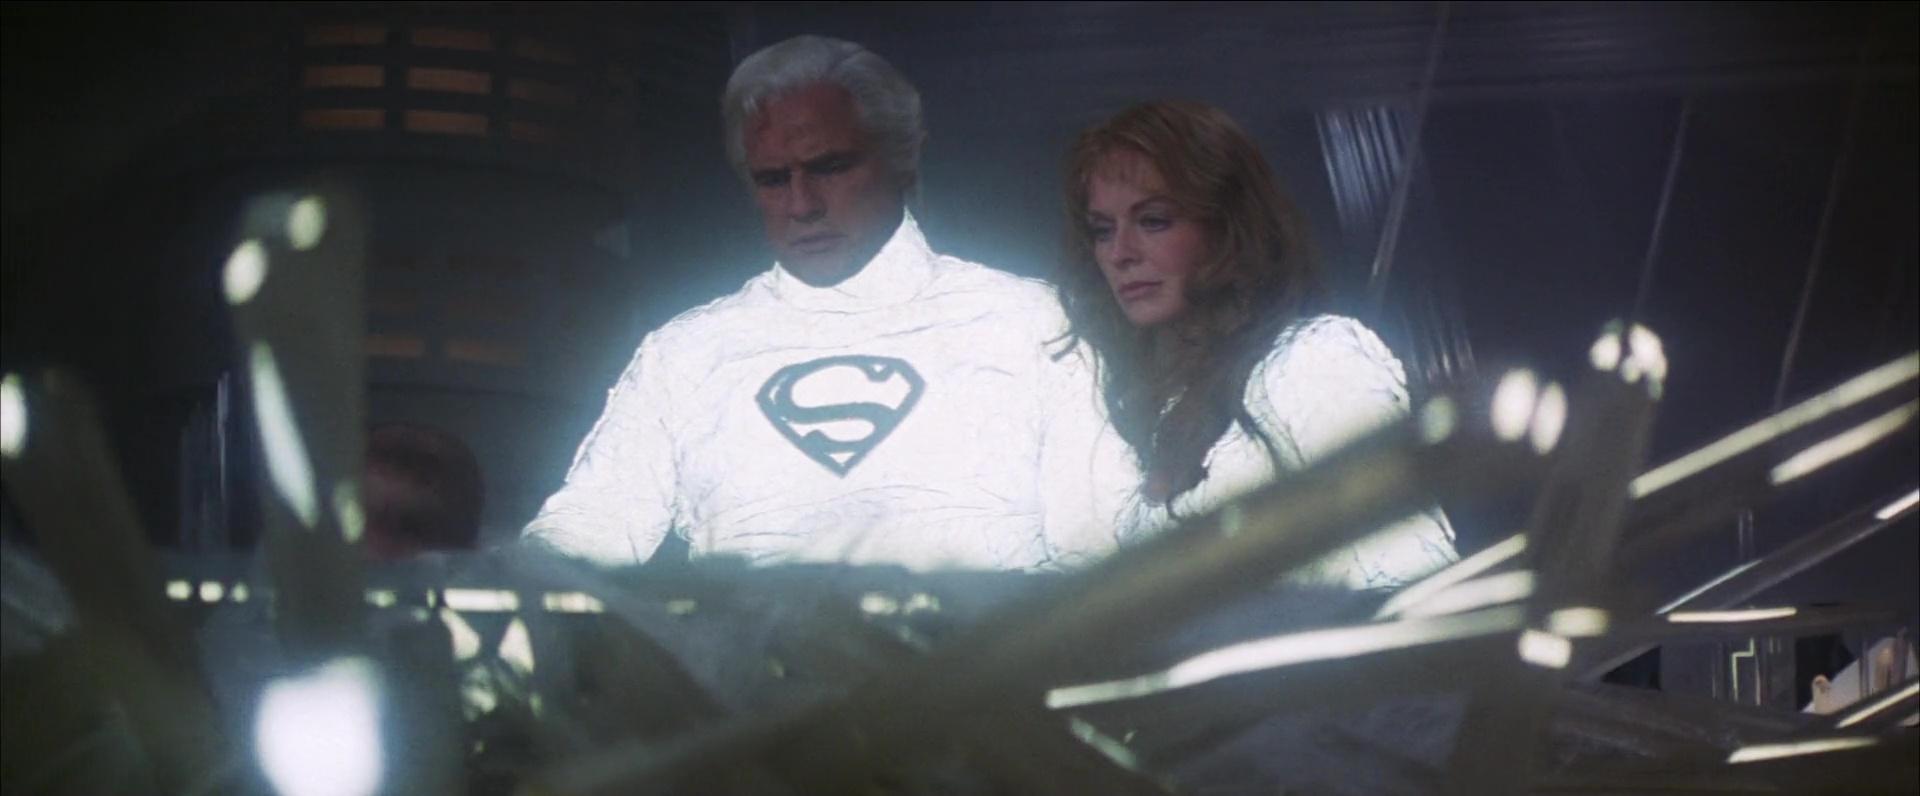 Superman: The Movie   Smallville Wiki   FANDOM powered by Wikia